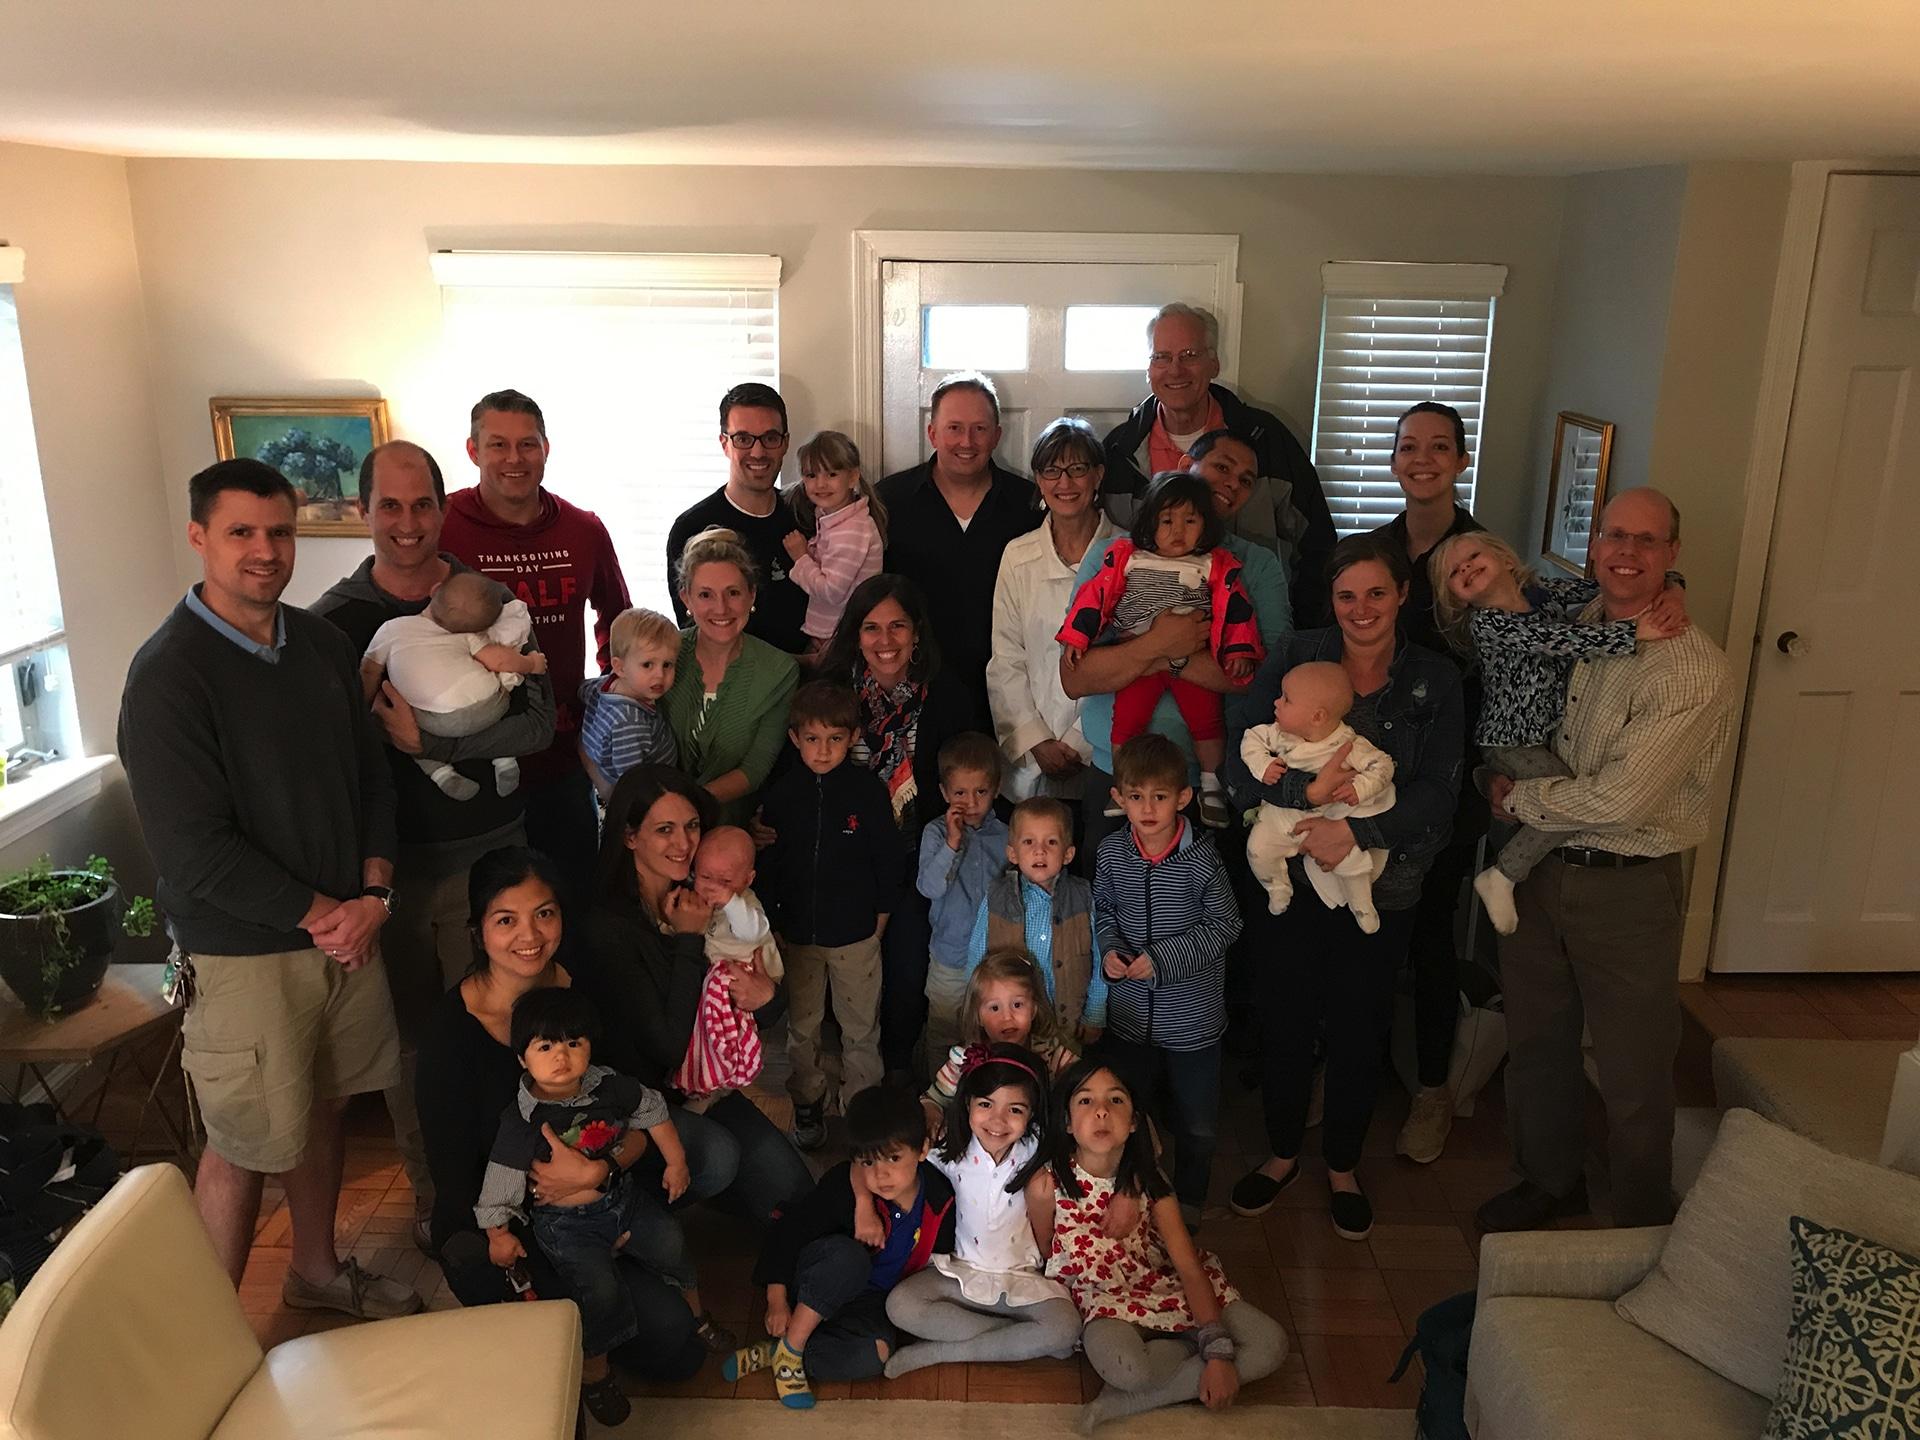 Church fellowship group